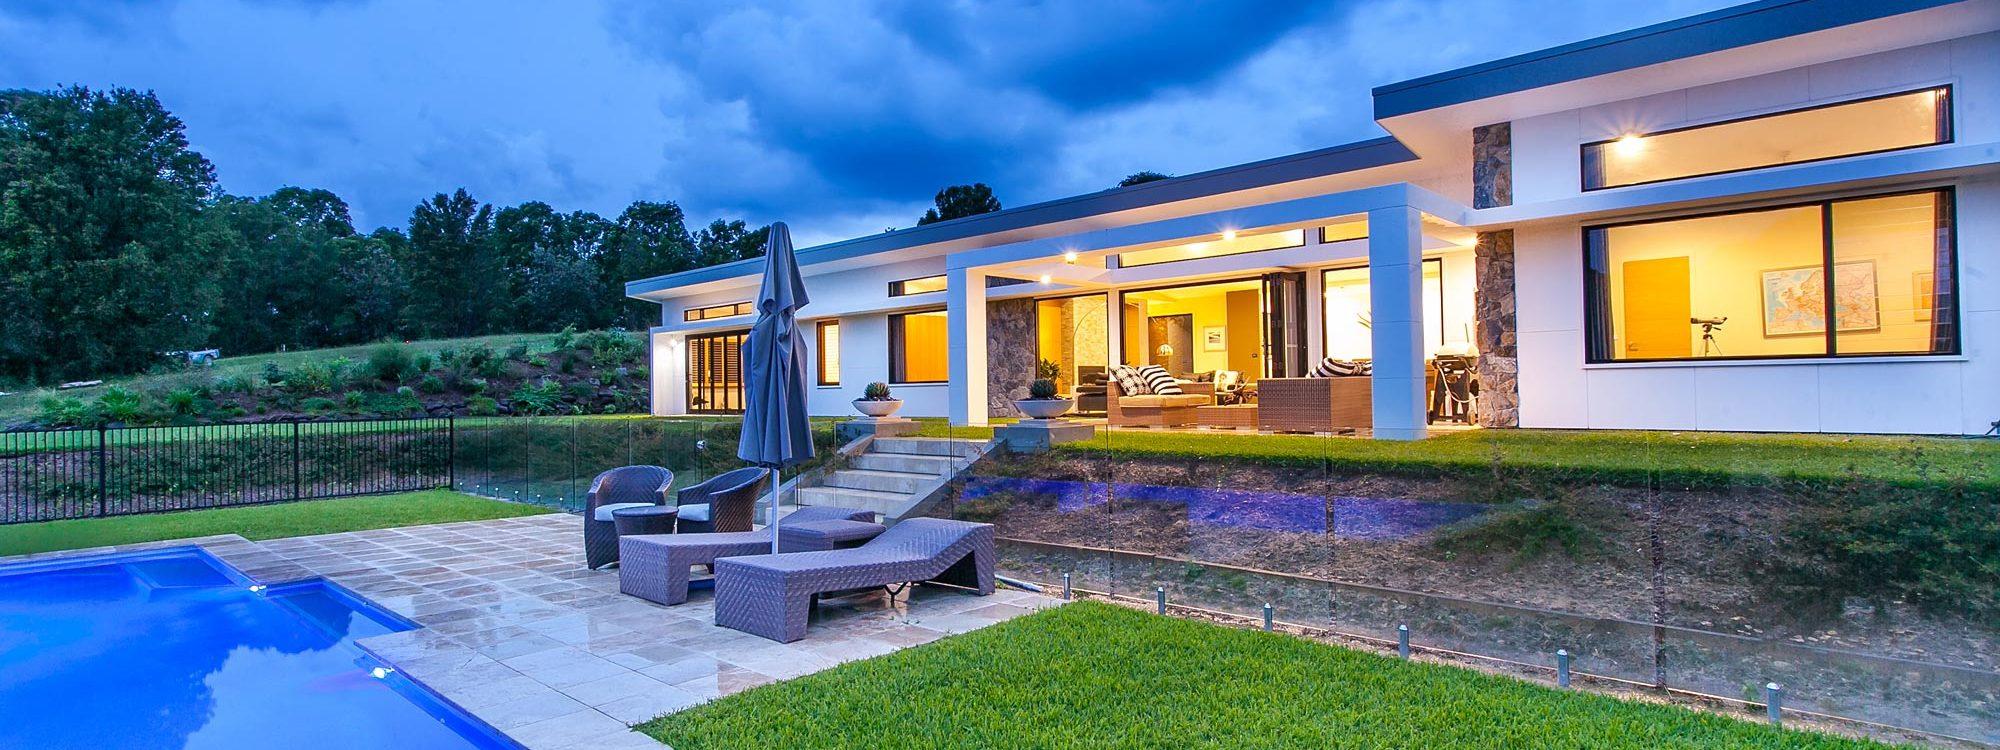 Byron Bay Accommodation House – Enjoy Your Holidays